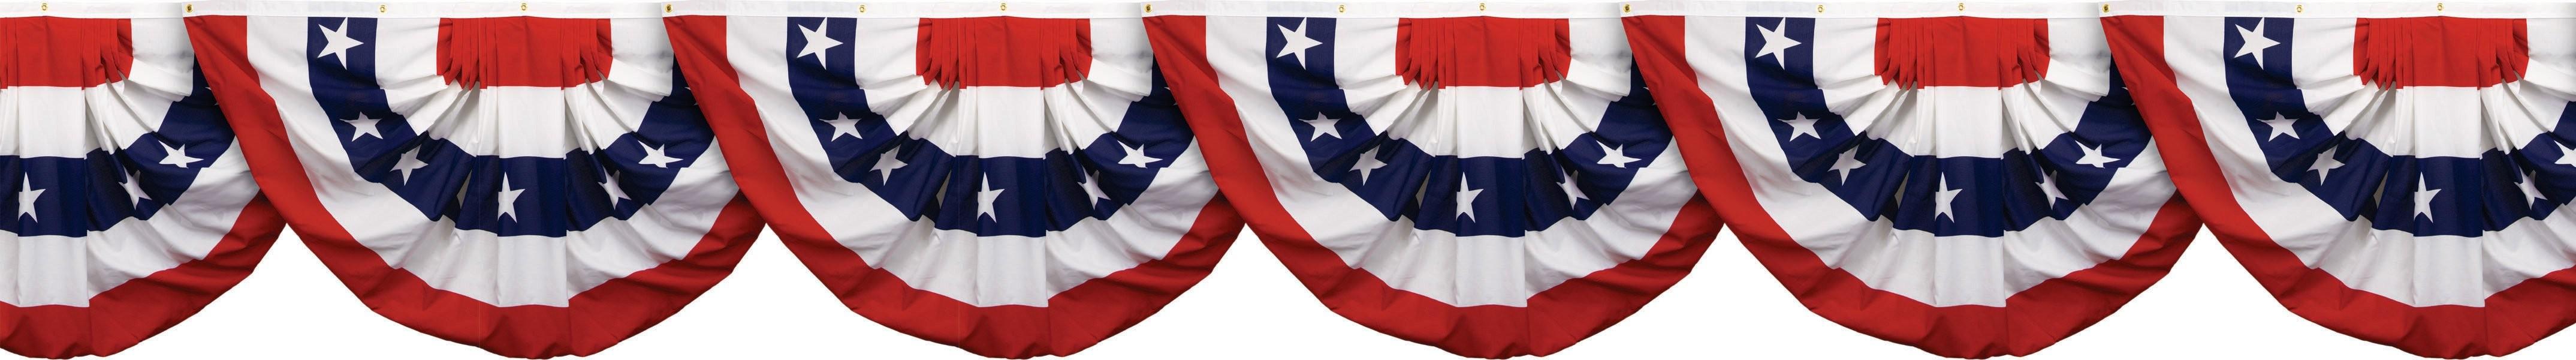 patriotic-bunting2